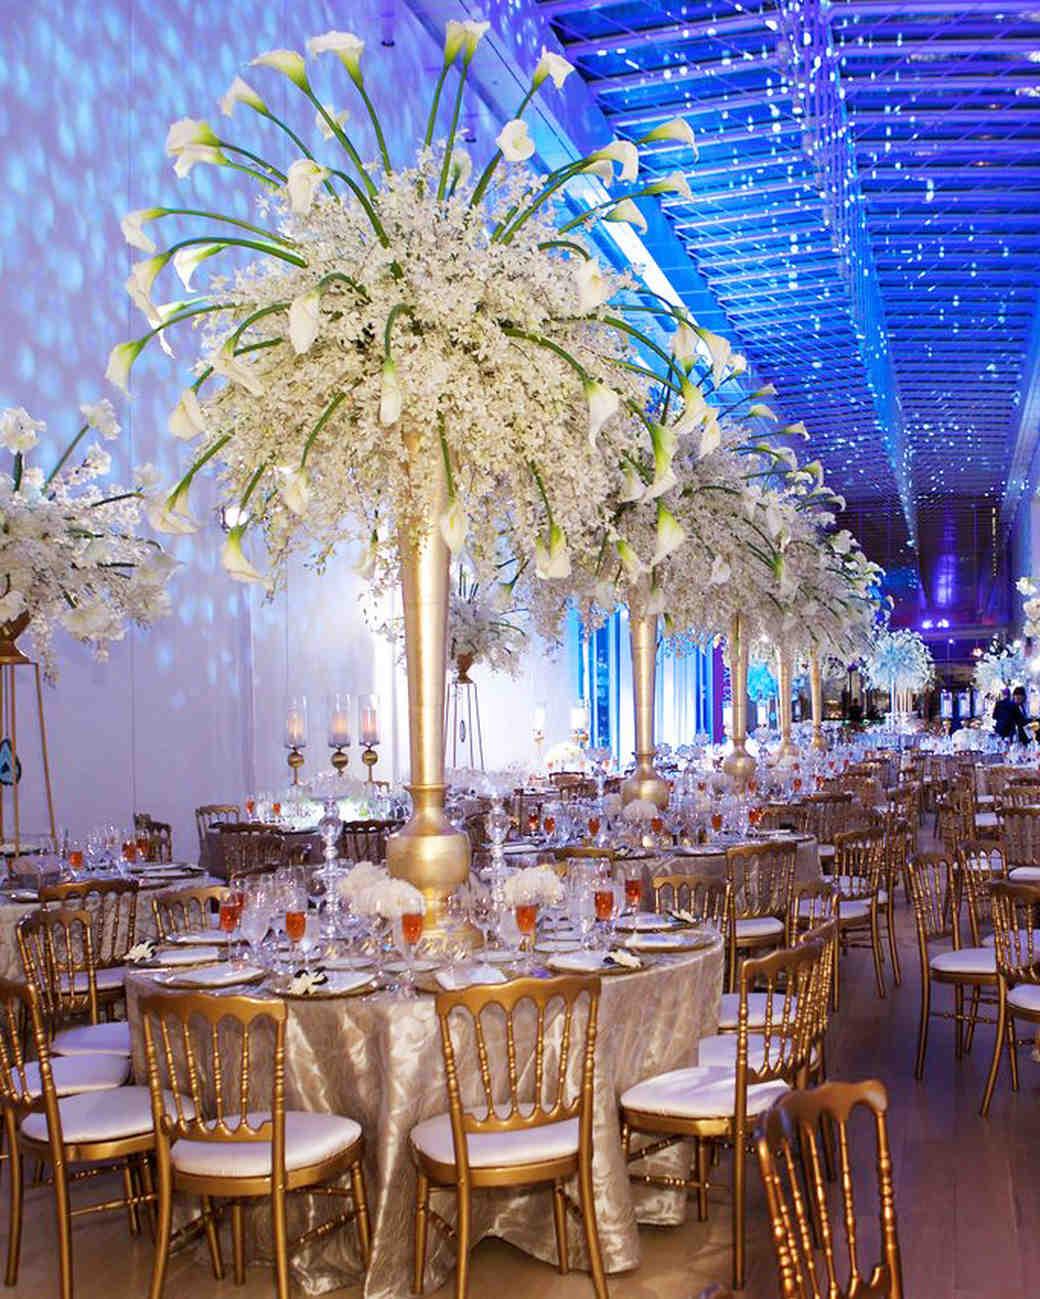 7-kehoe-designs-wedding-reception-0116.jpg